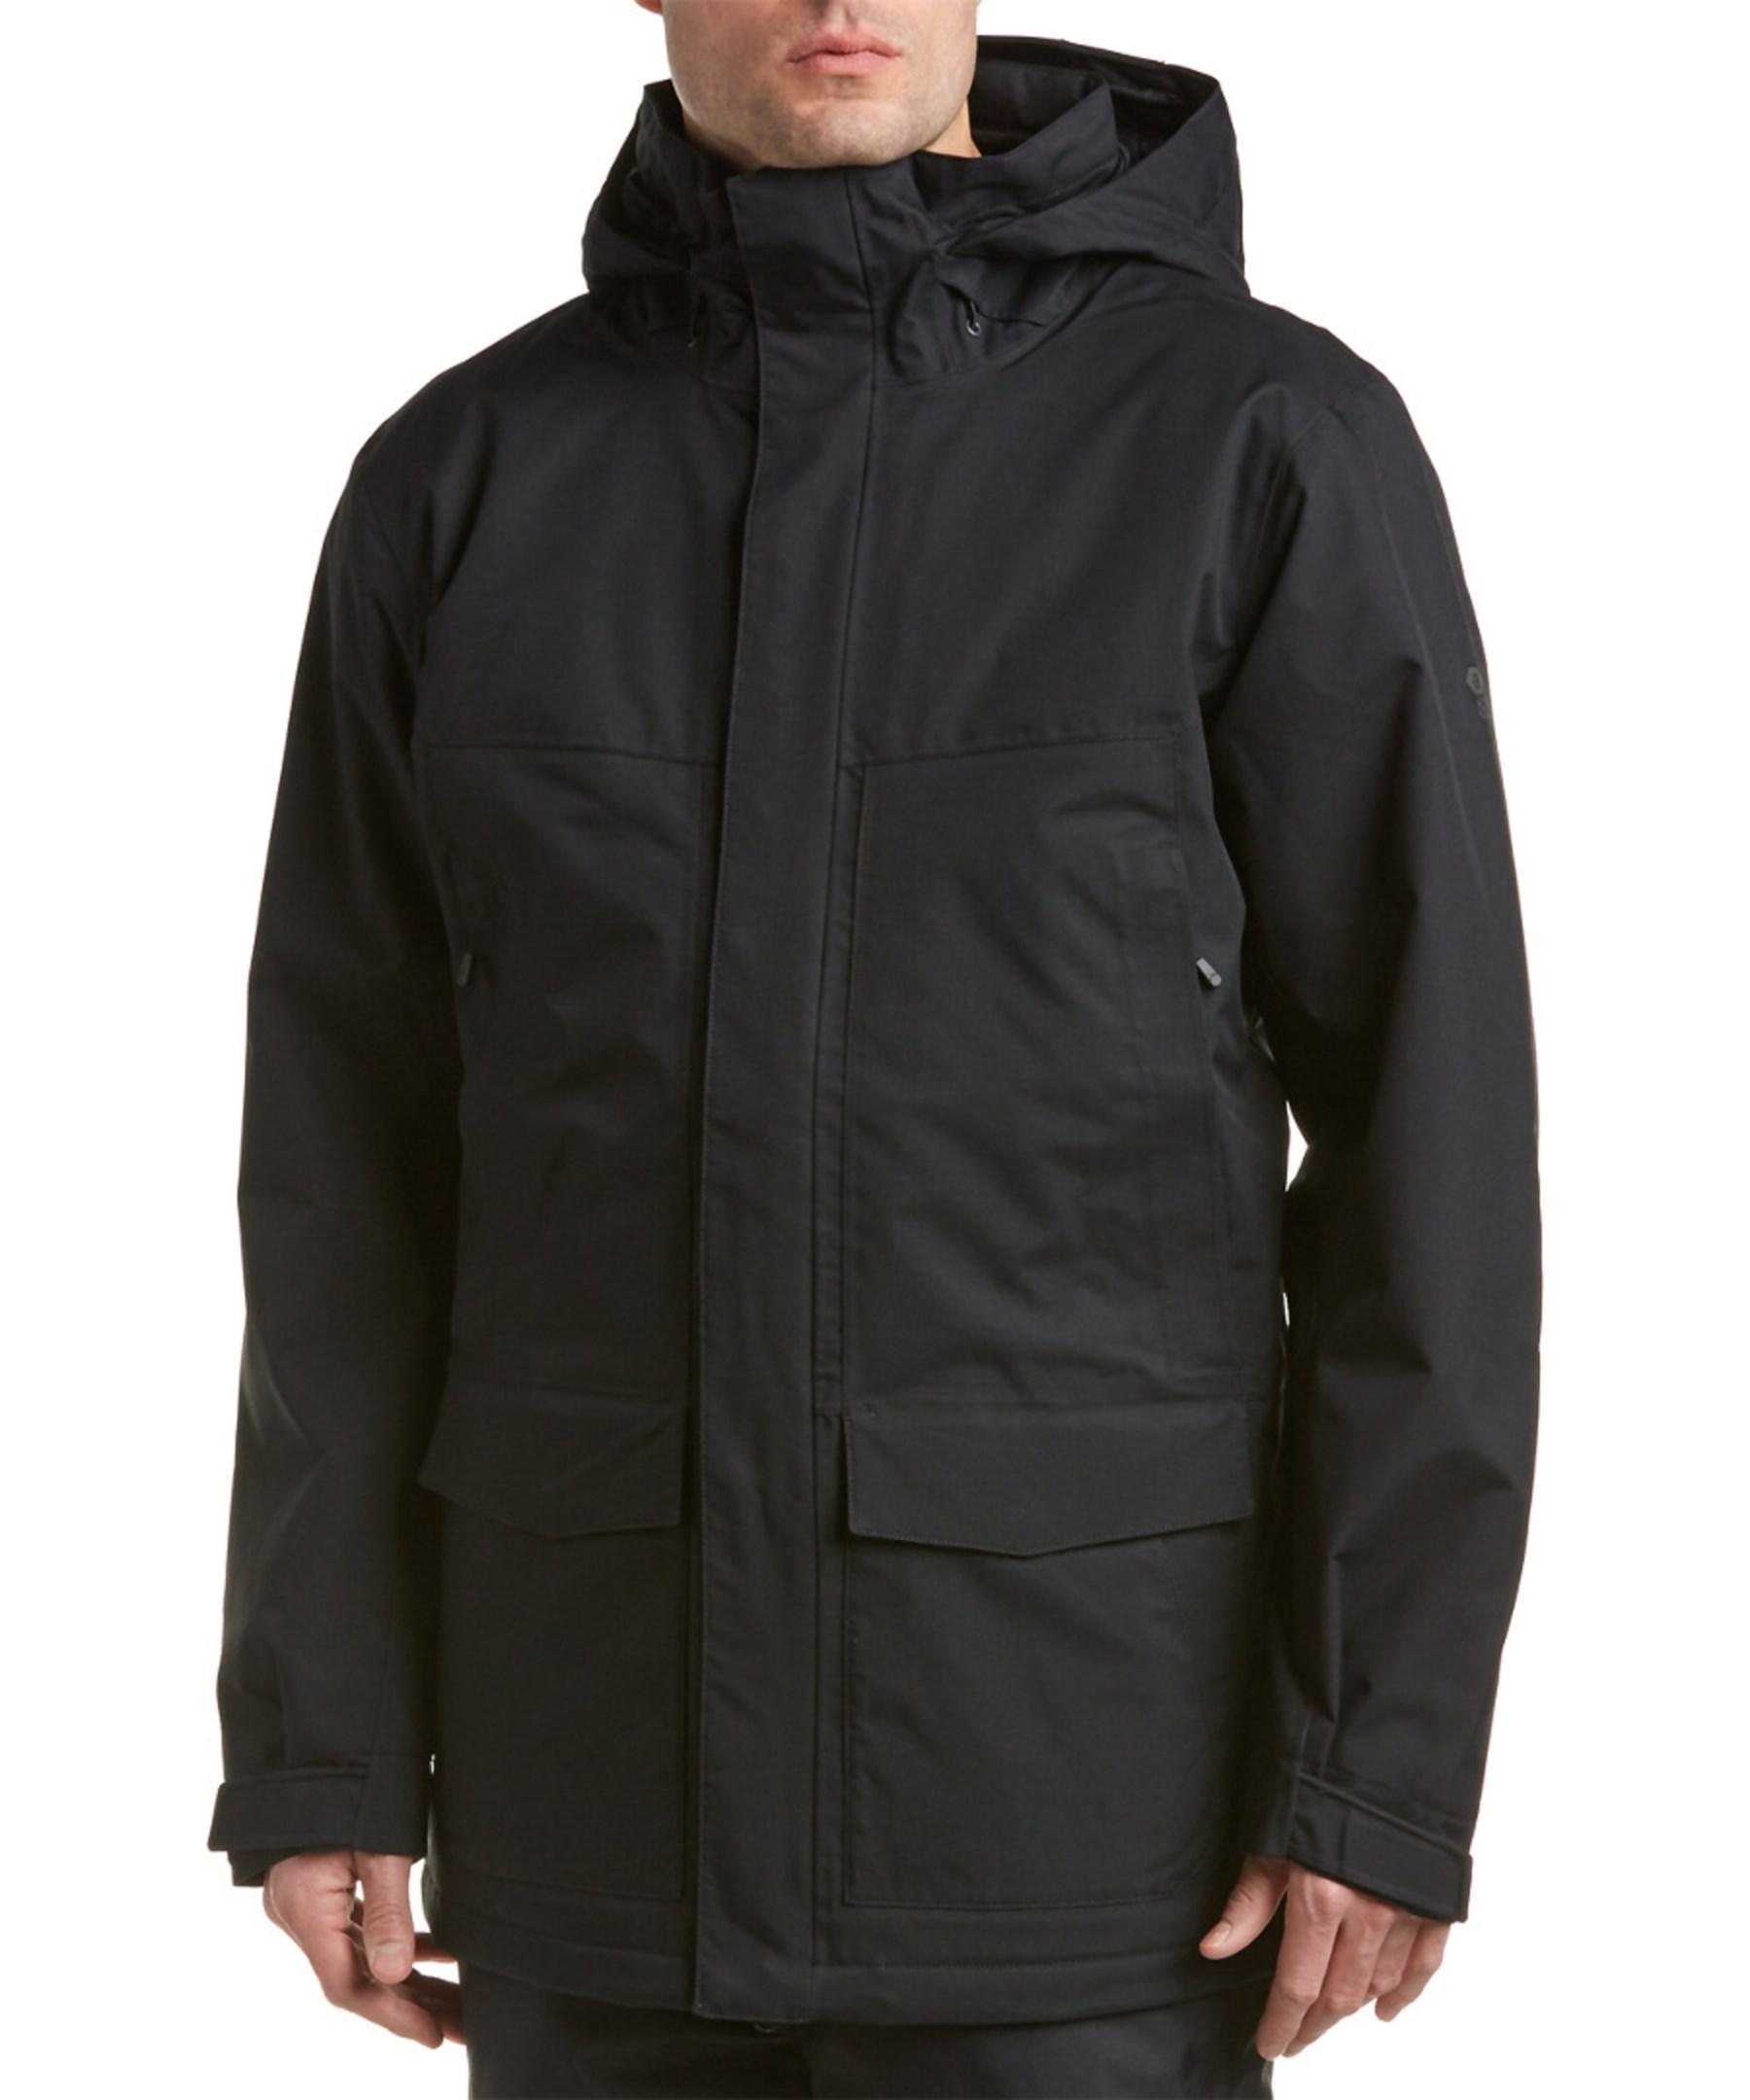 Mountain Hardwear Radian Insulated Coat In Black For Men